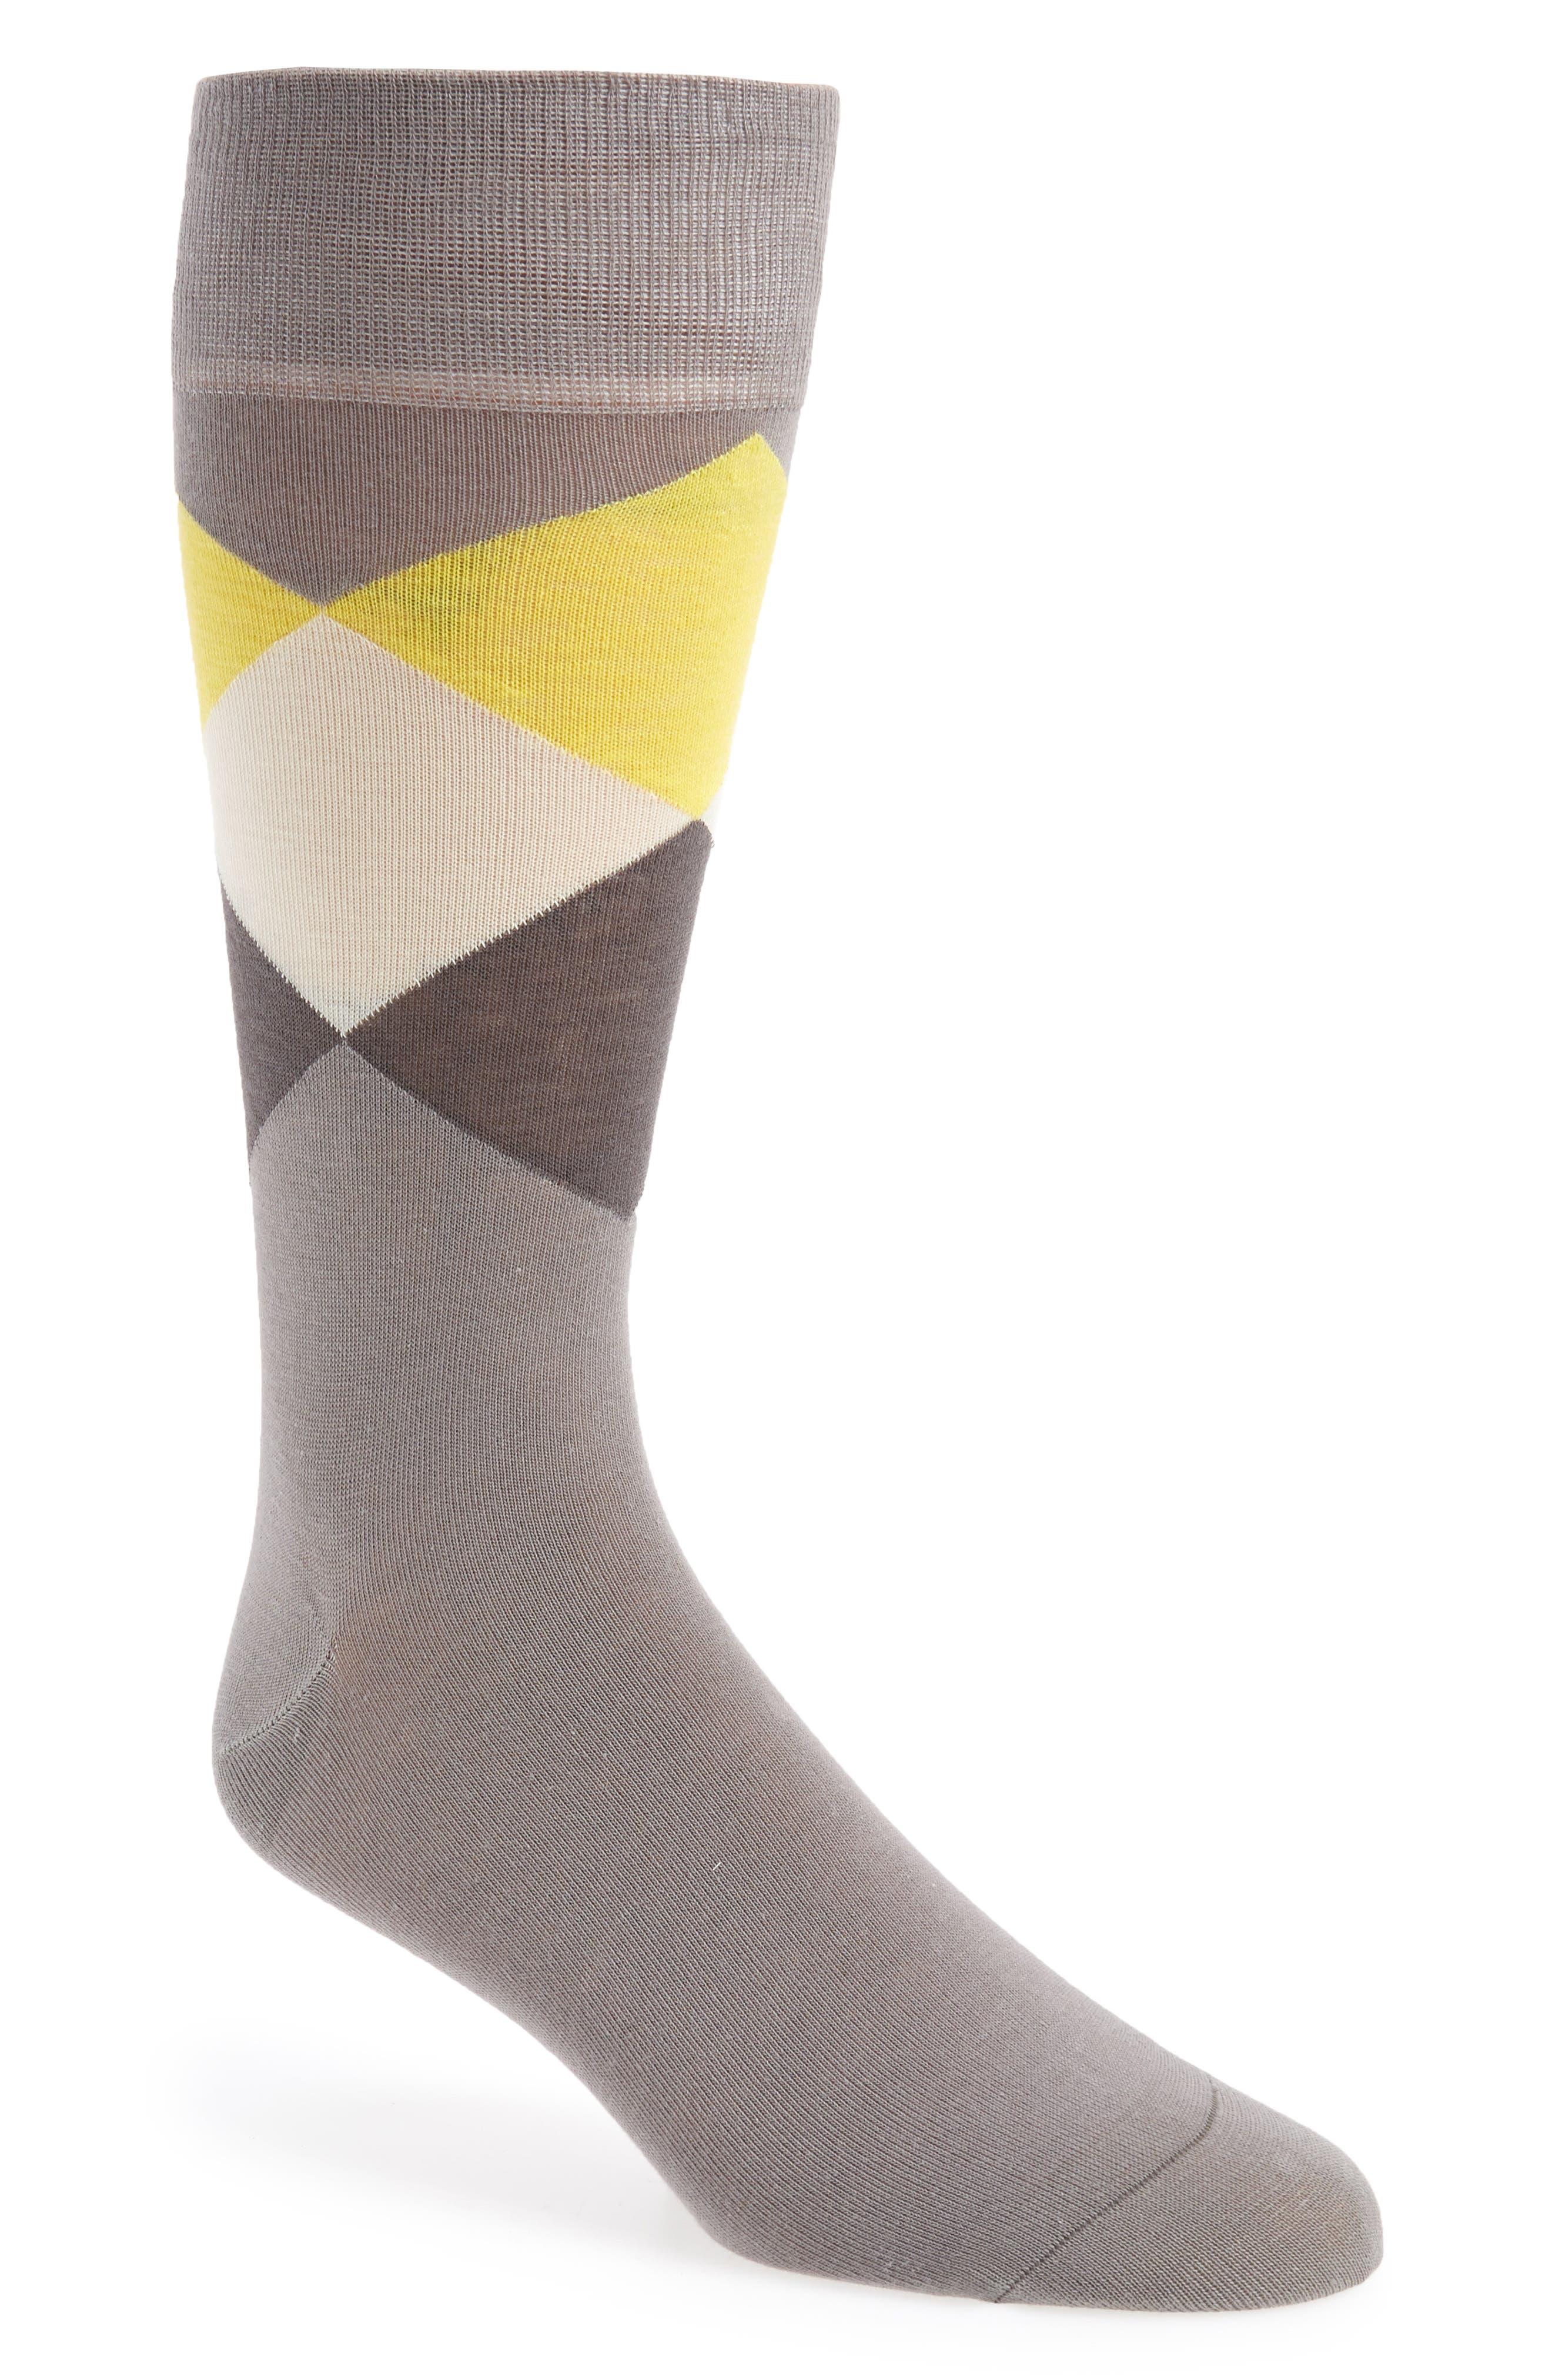 Large Diamond Crew Socks,                         Main,                         color, 030